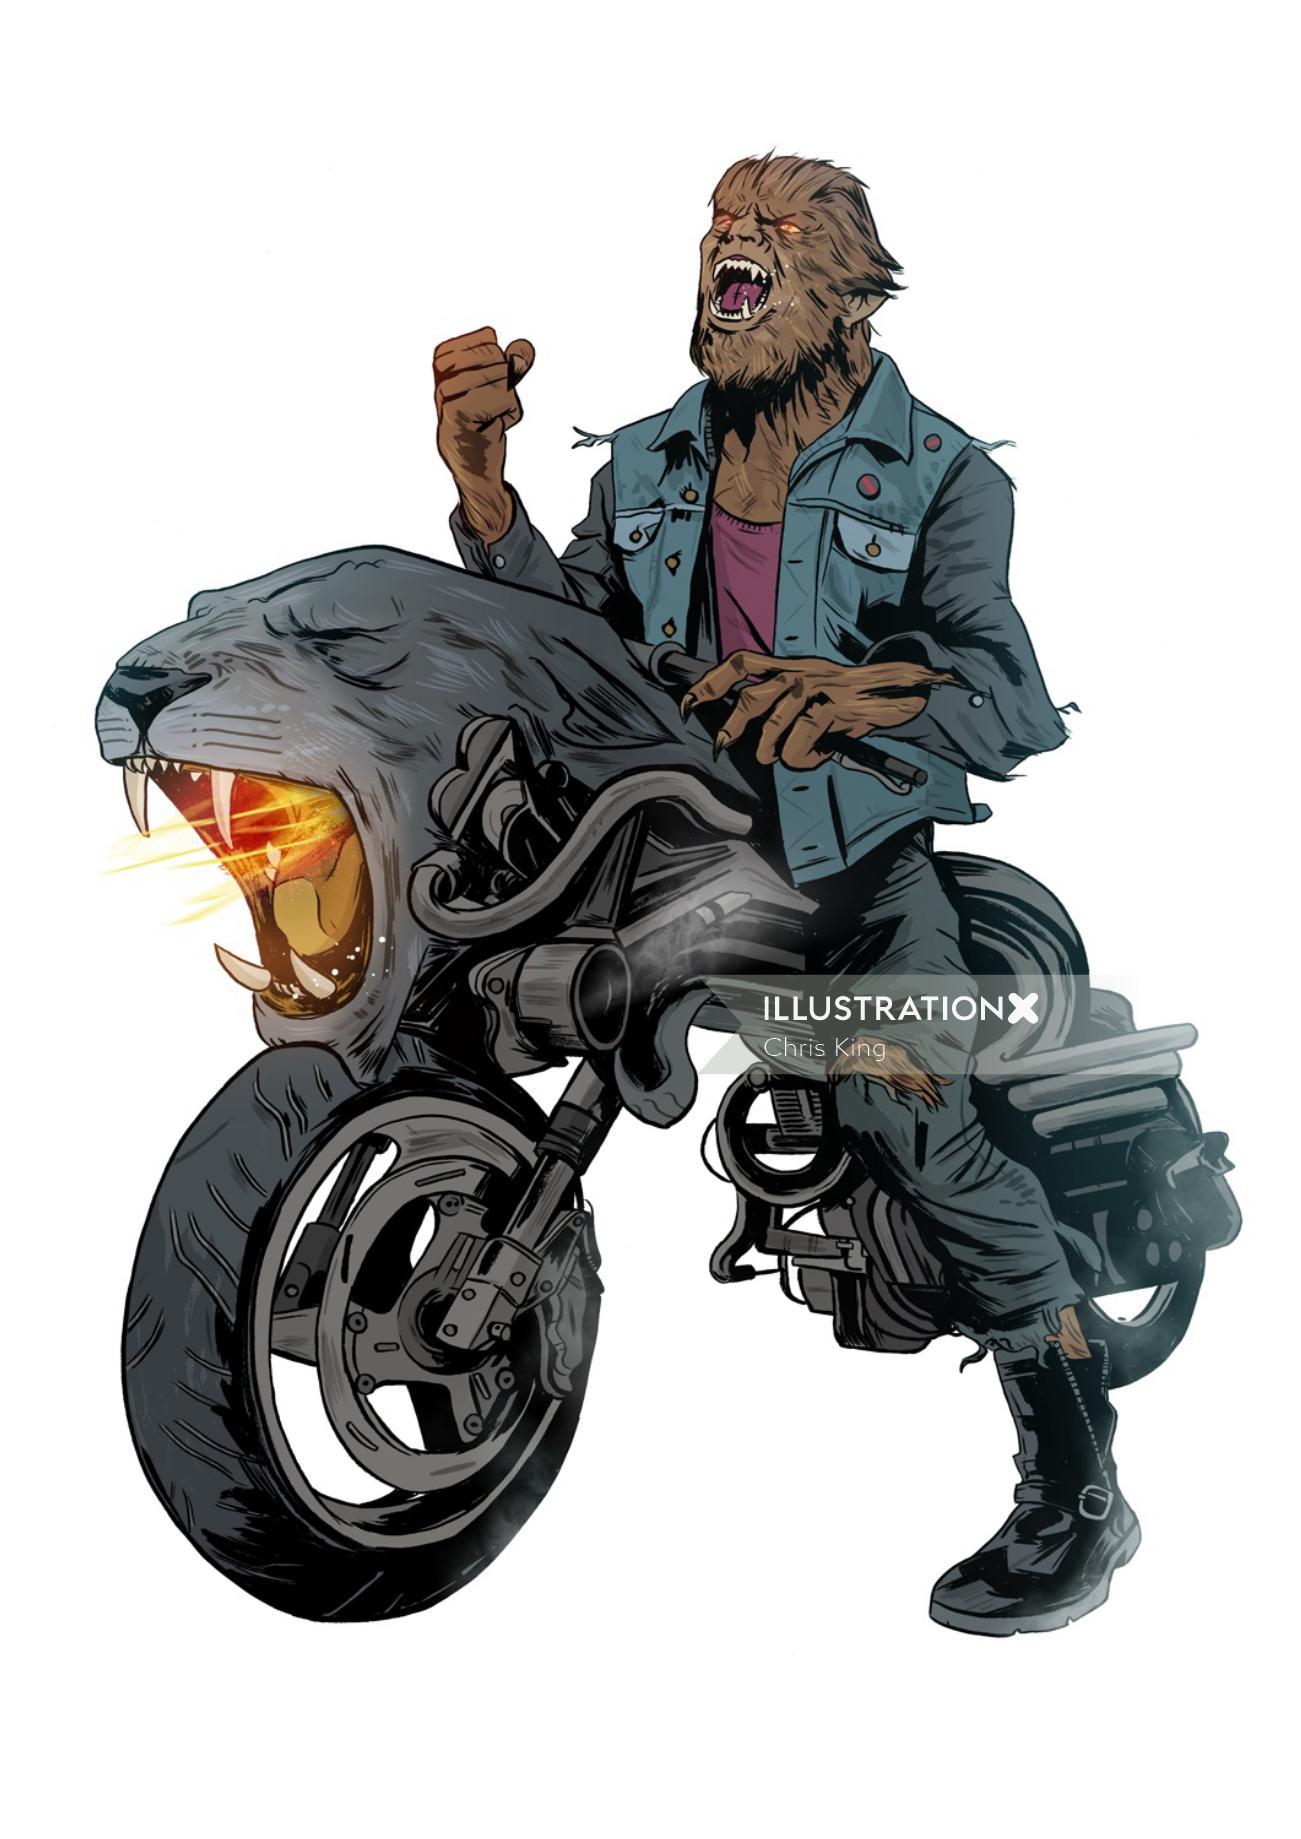 An illustration of Werewolf